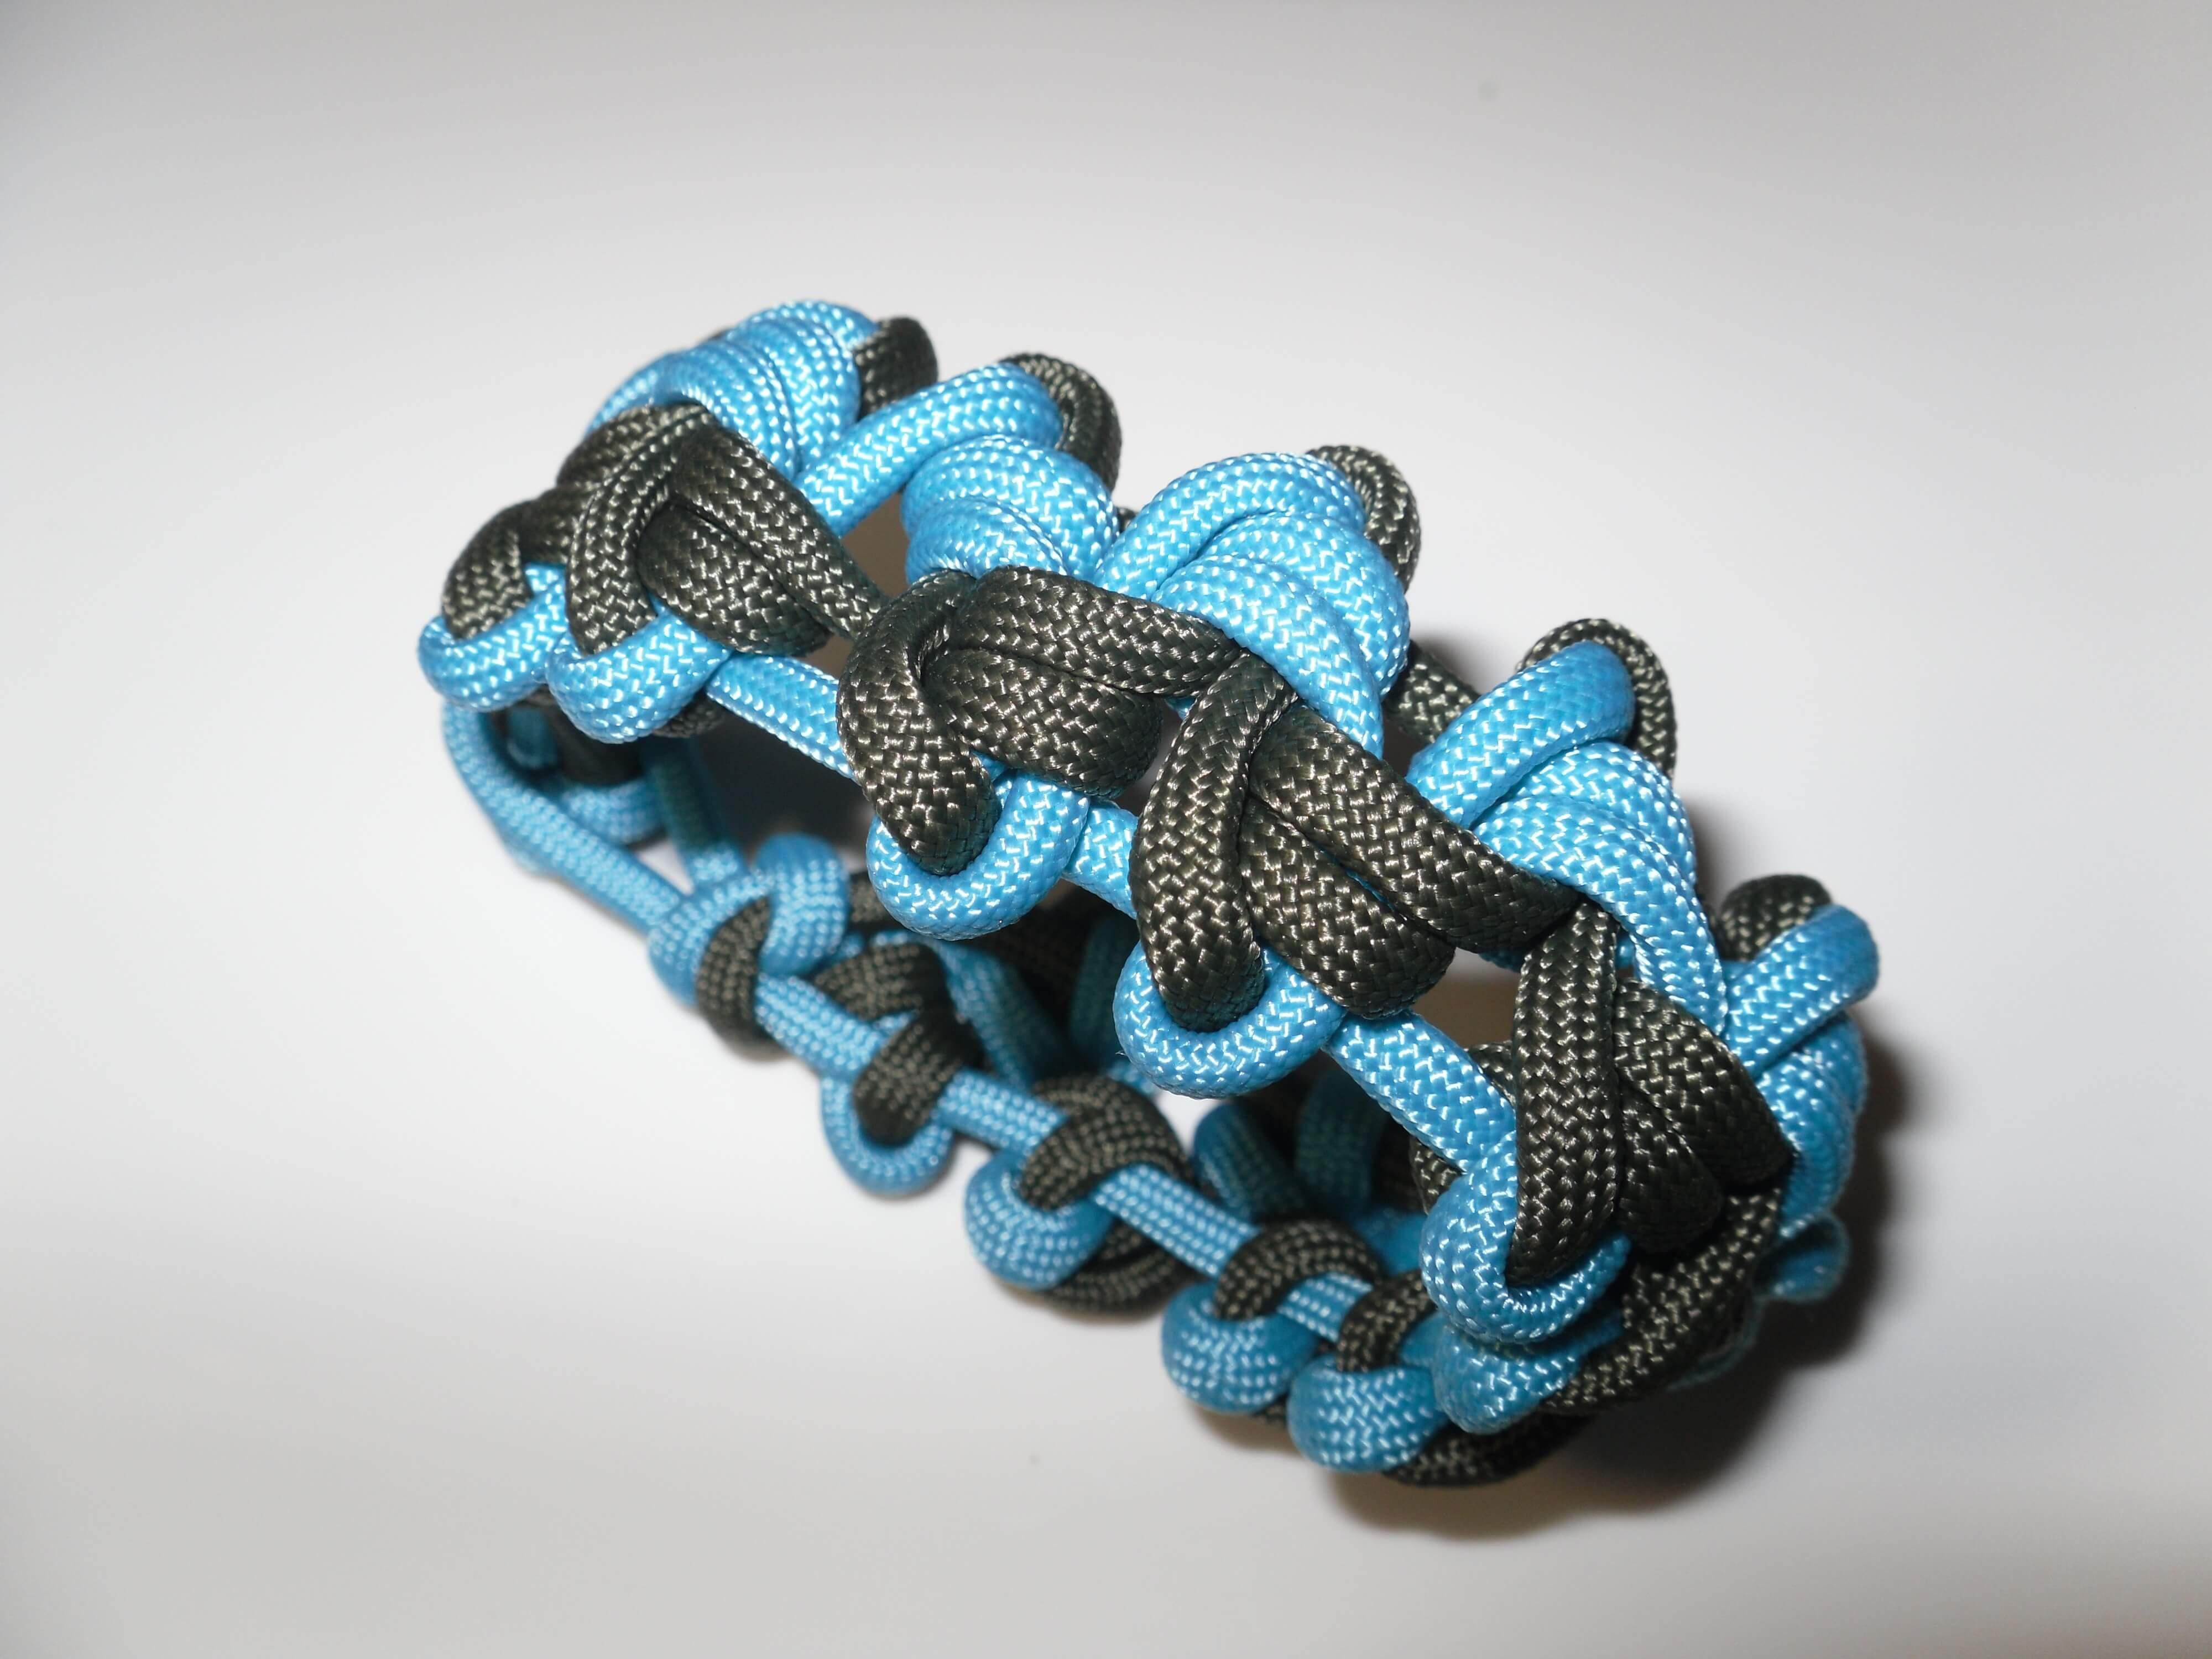 Beliebt Ein neues cooles Paracord Armband knüpfen WY13